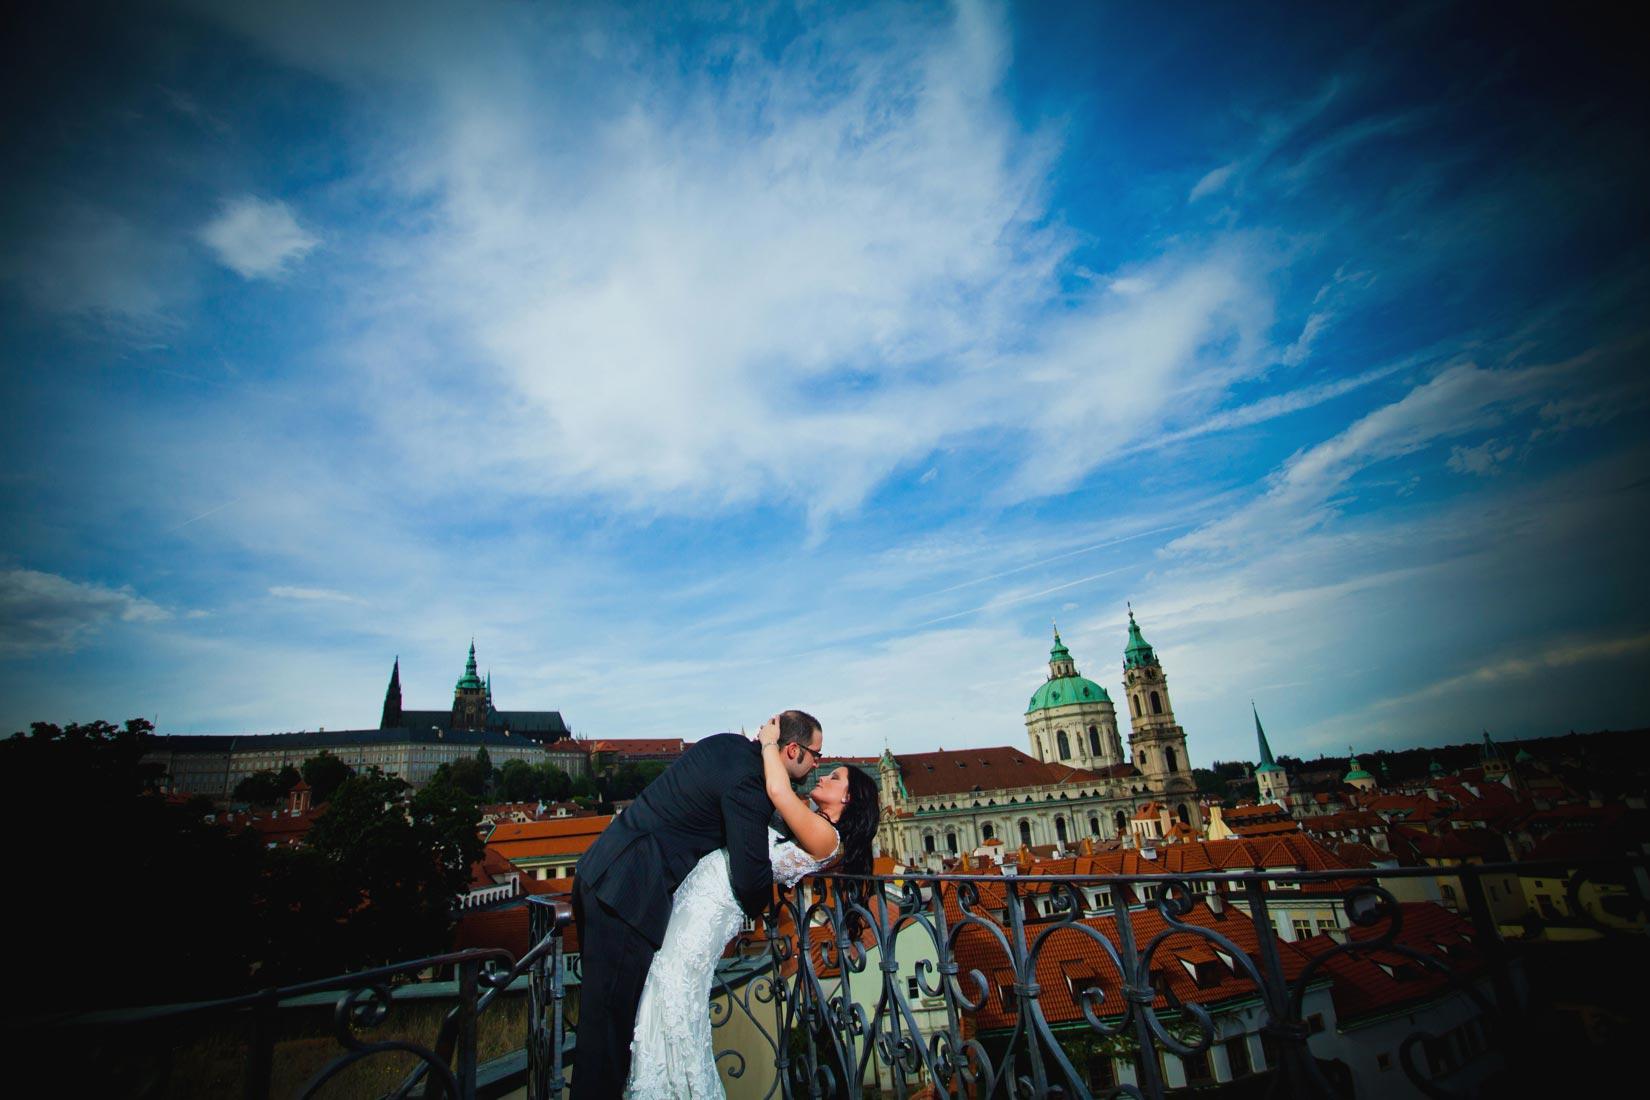 Vrtbovska Garden wedding / W&N / elopement wedding